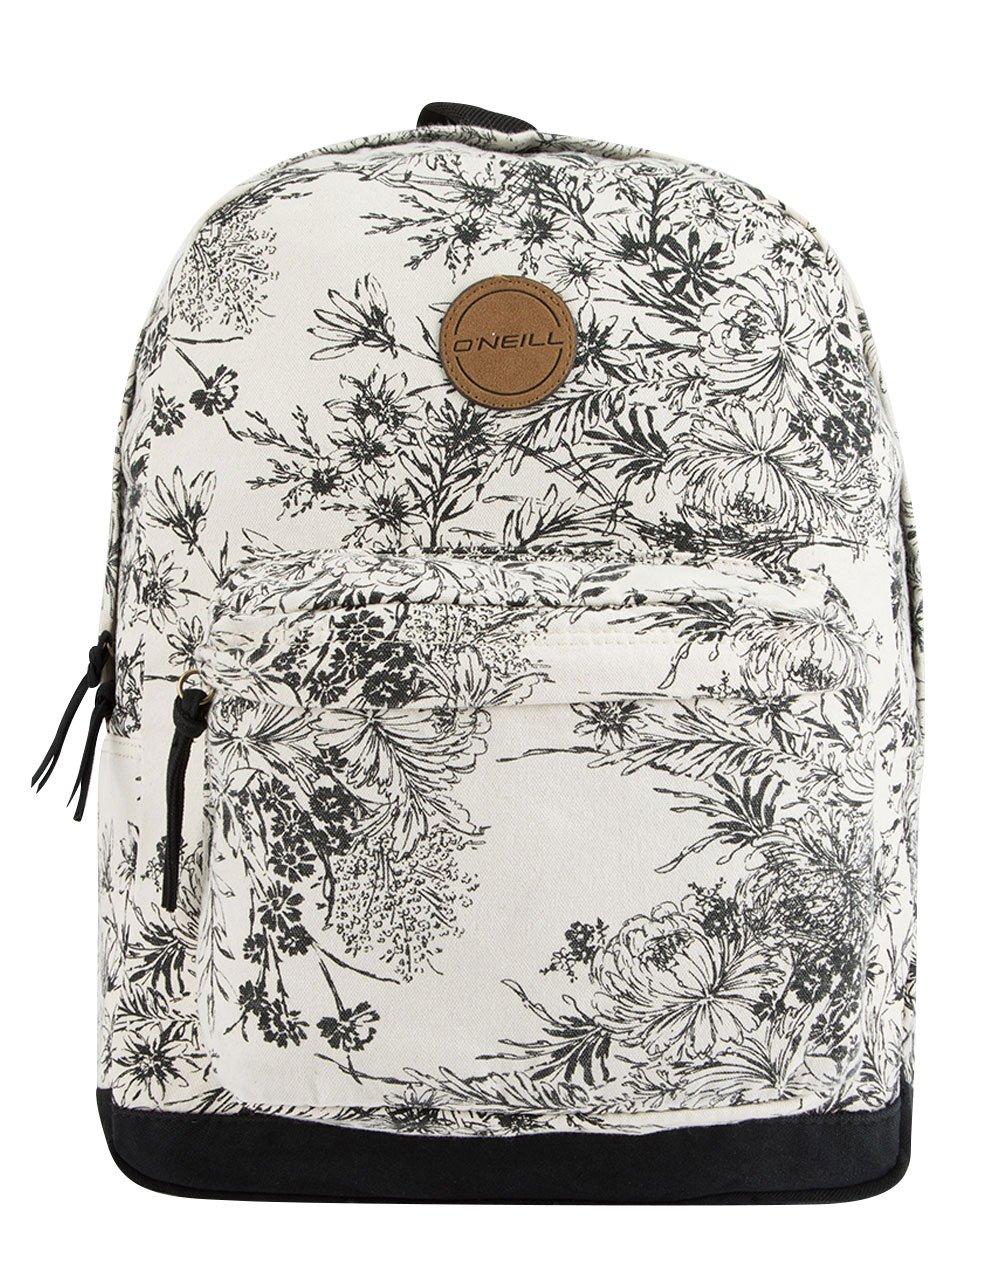 O'NEILL Beachblazer Natural Backpack, Natural